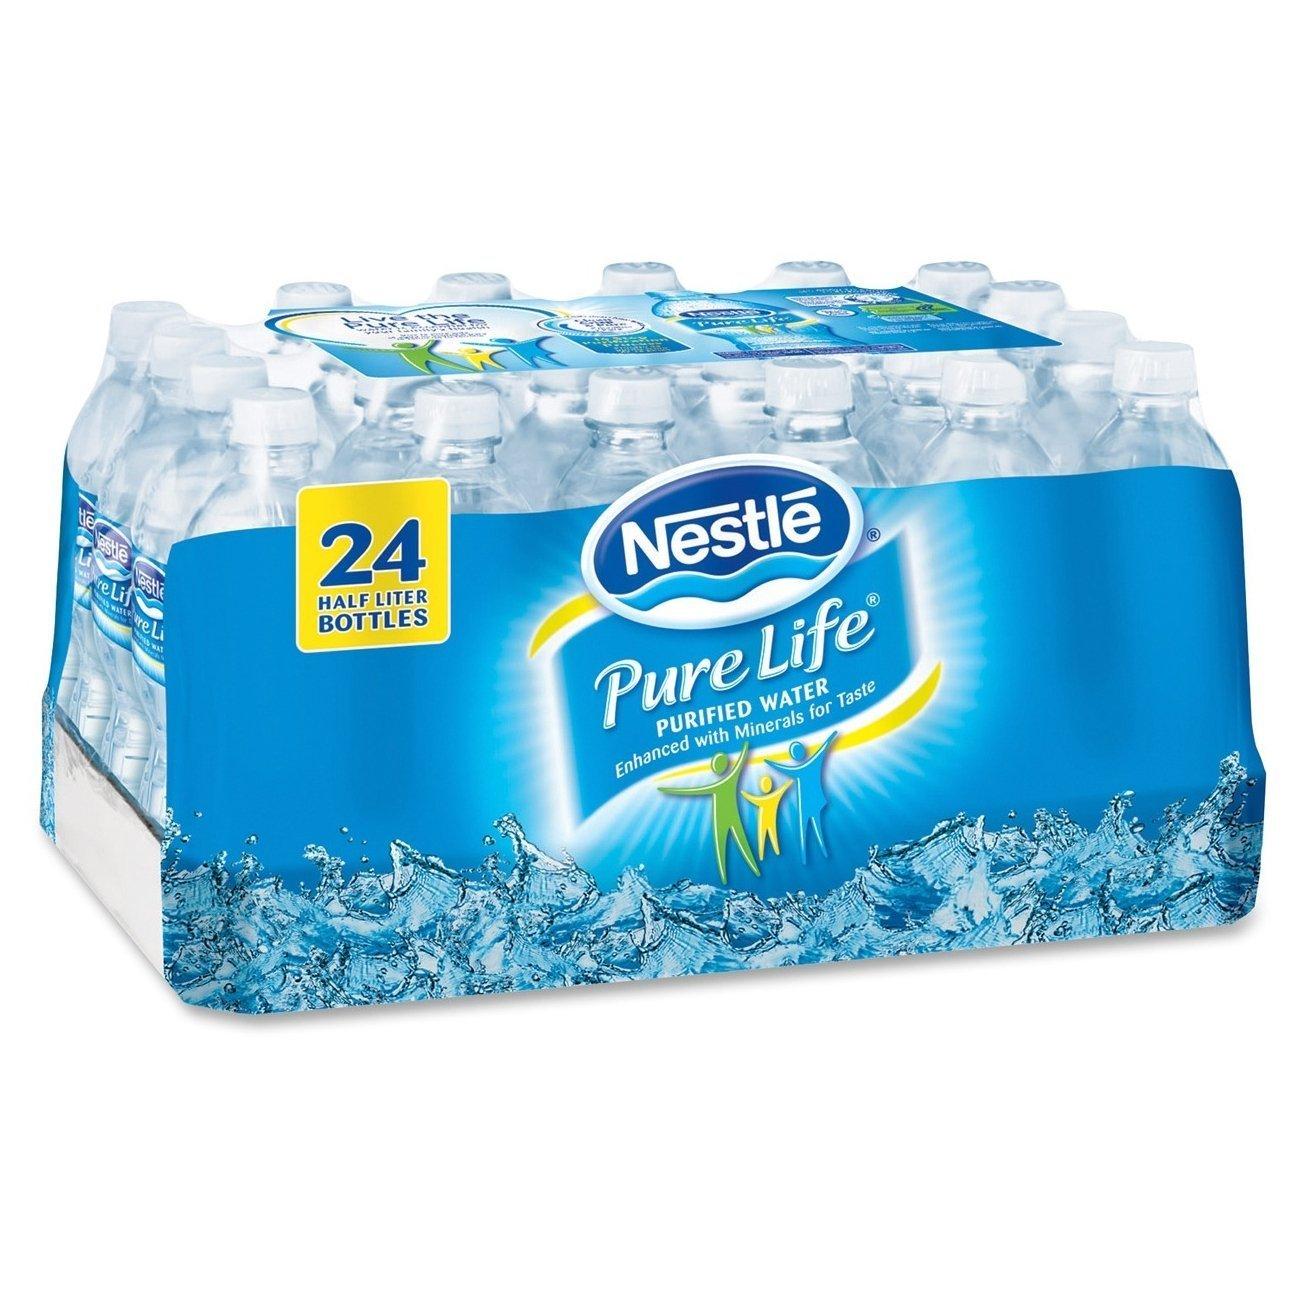 Nestlé Pure Life Bottled Purified Water, 16.9 oz. Bottles, 24/Case